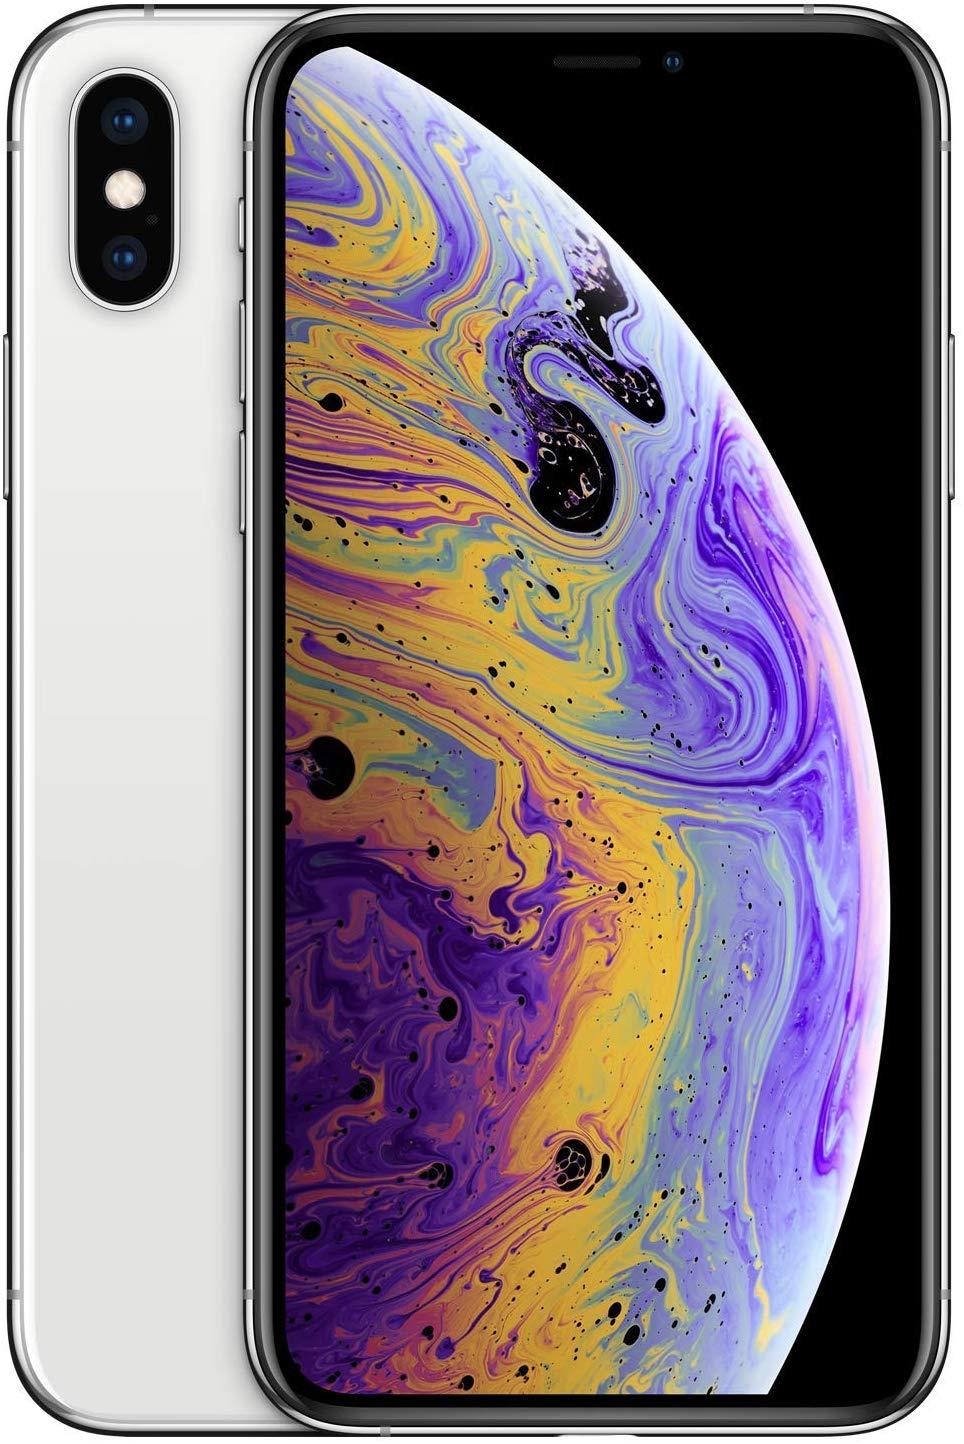 iPhones 30-35% off at Amazon (7,8+,Xs & xs max)- Apple iPhone XS (64GB) £629